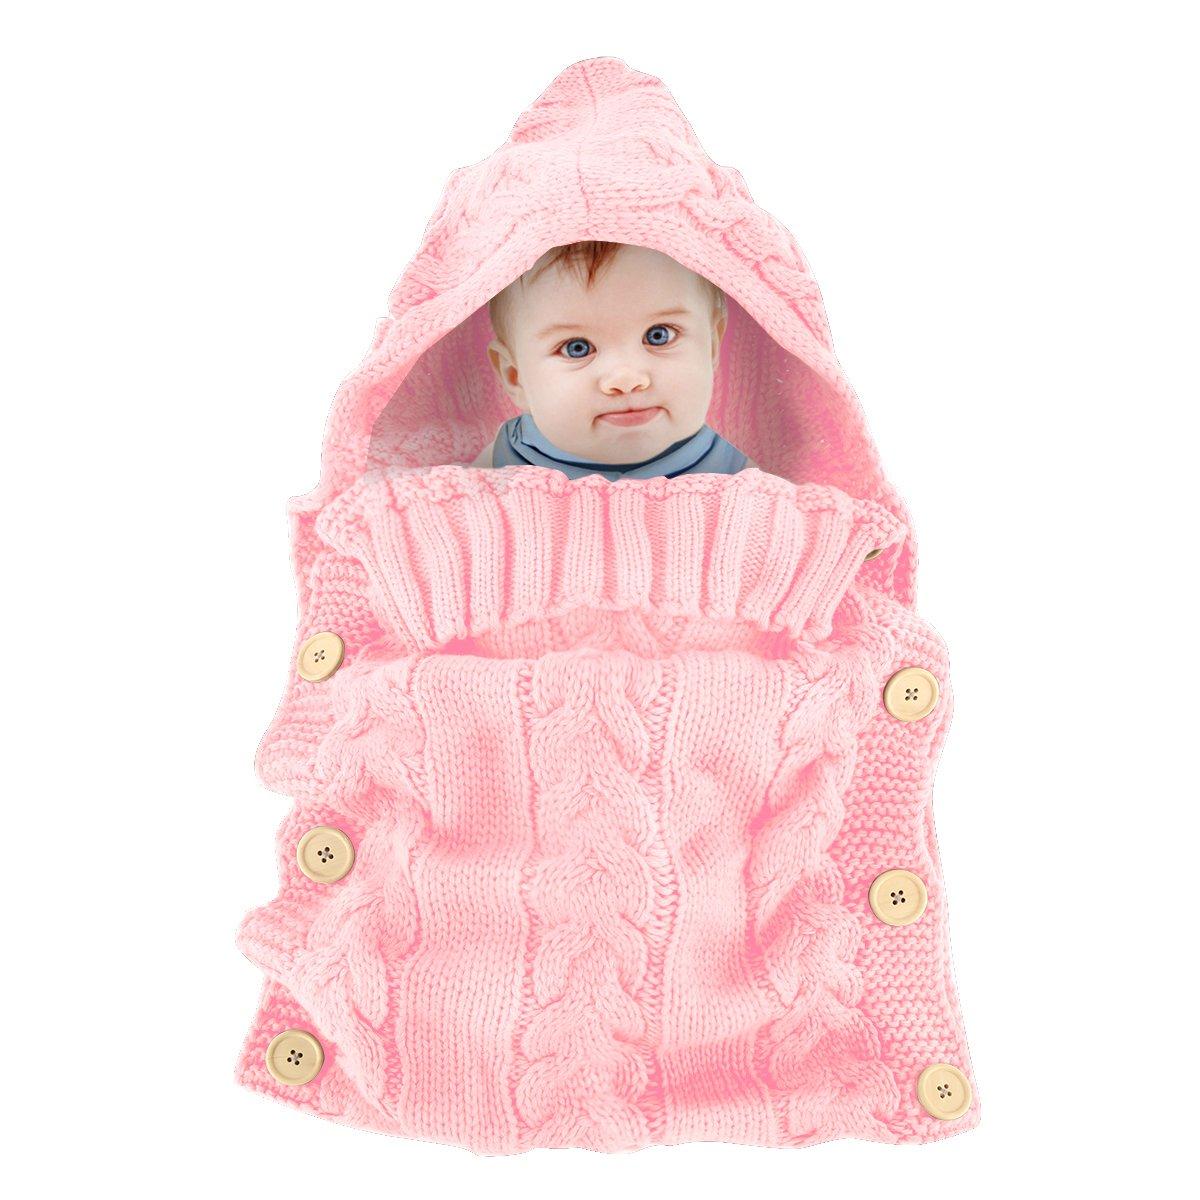 Colorful Newborn Baby Wrap Swaddle Blanket, Oenbopo Baby Kids Toddler Knit Blanket Swaddle Sleeping Bag Sack Sleep Bag Stroller Wrap for 0-12 Month Baby (Pink)